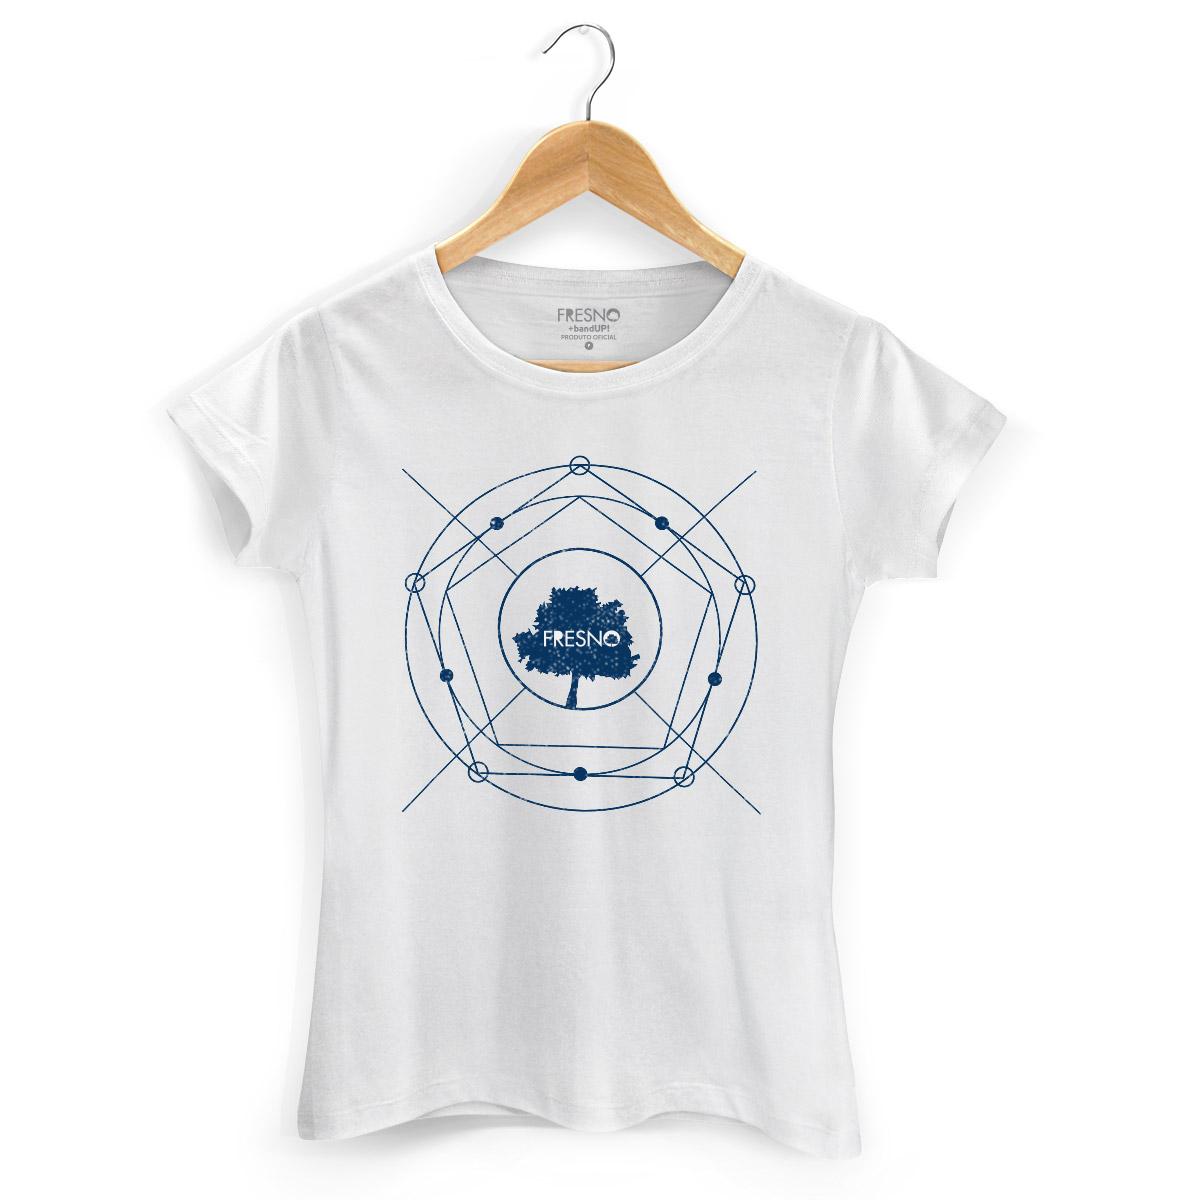 Camiseta Feminina Fresno Árvore Diagrama